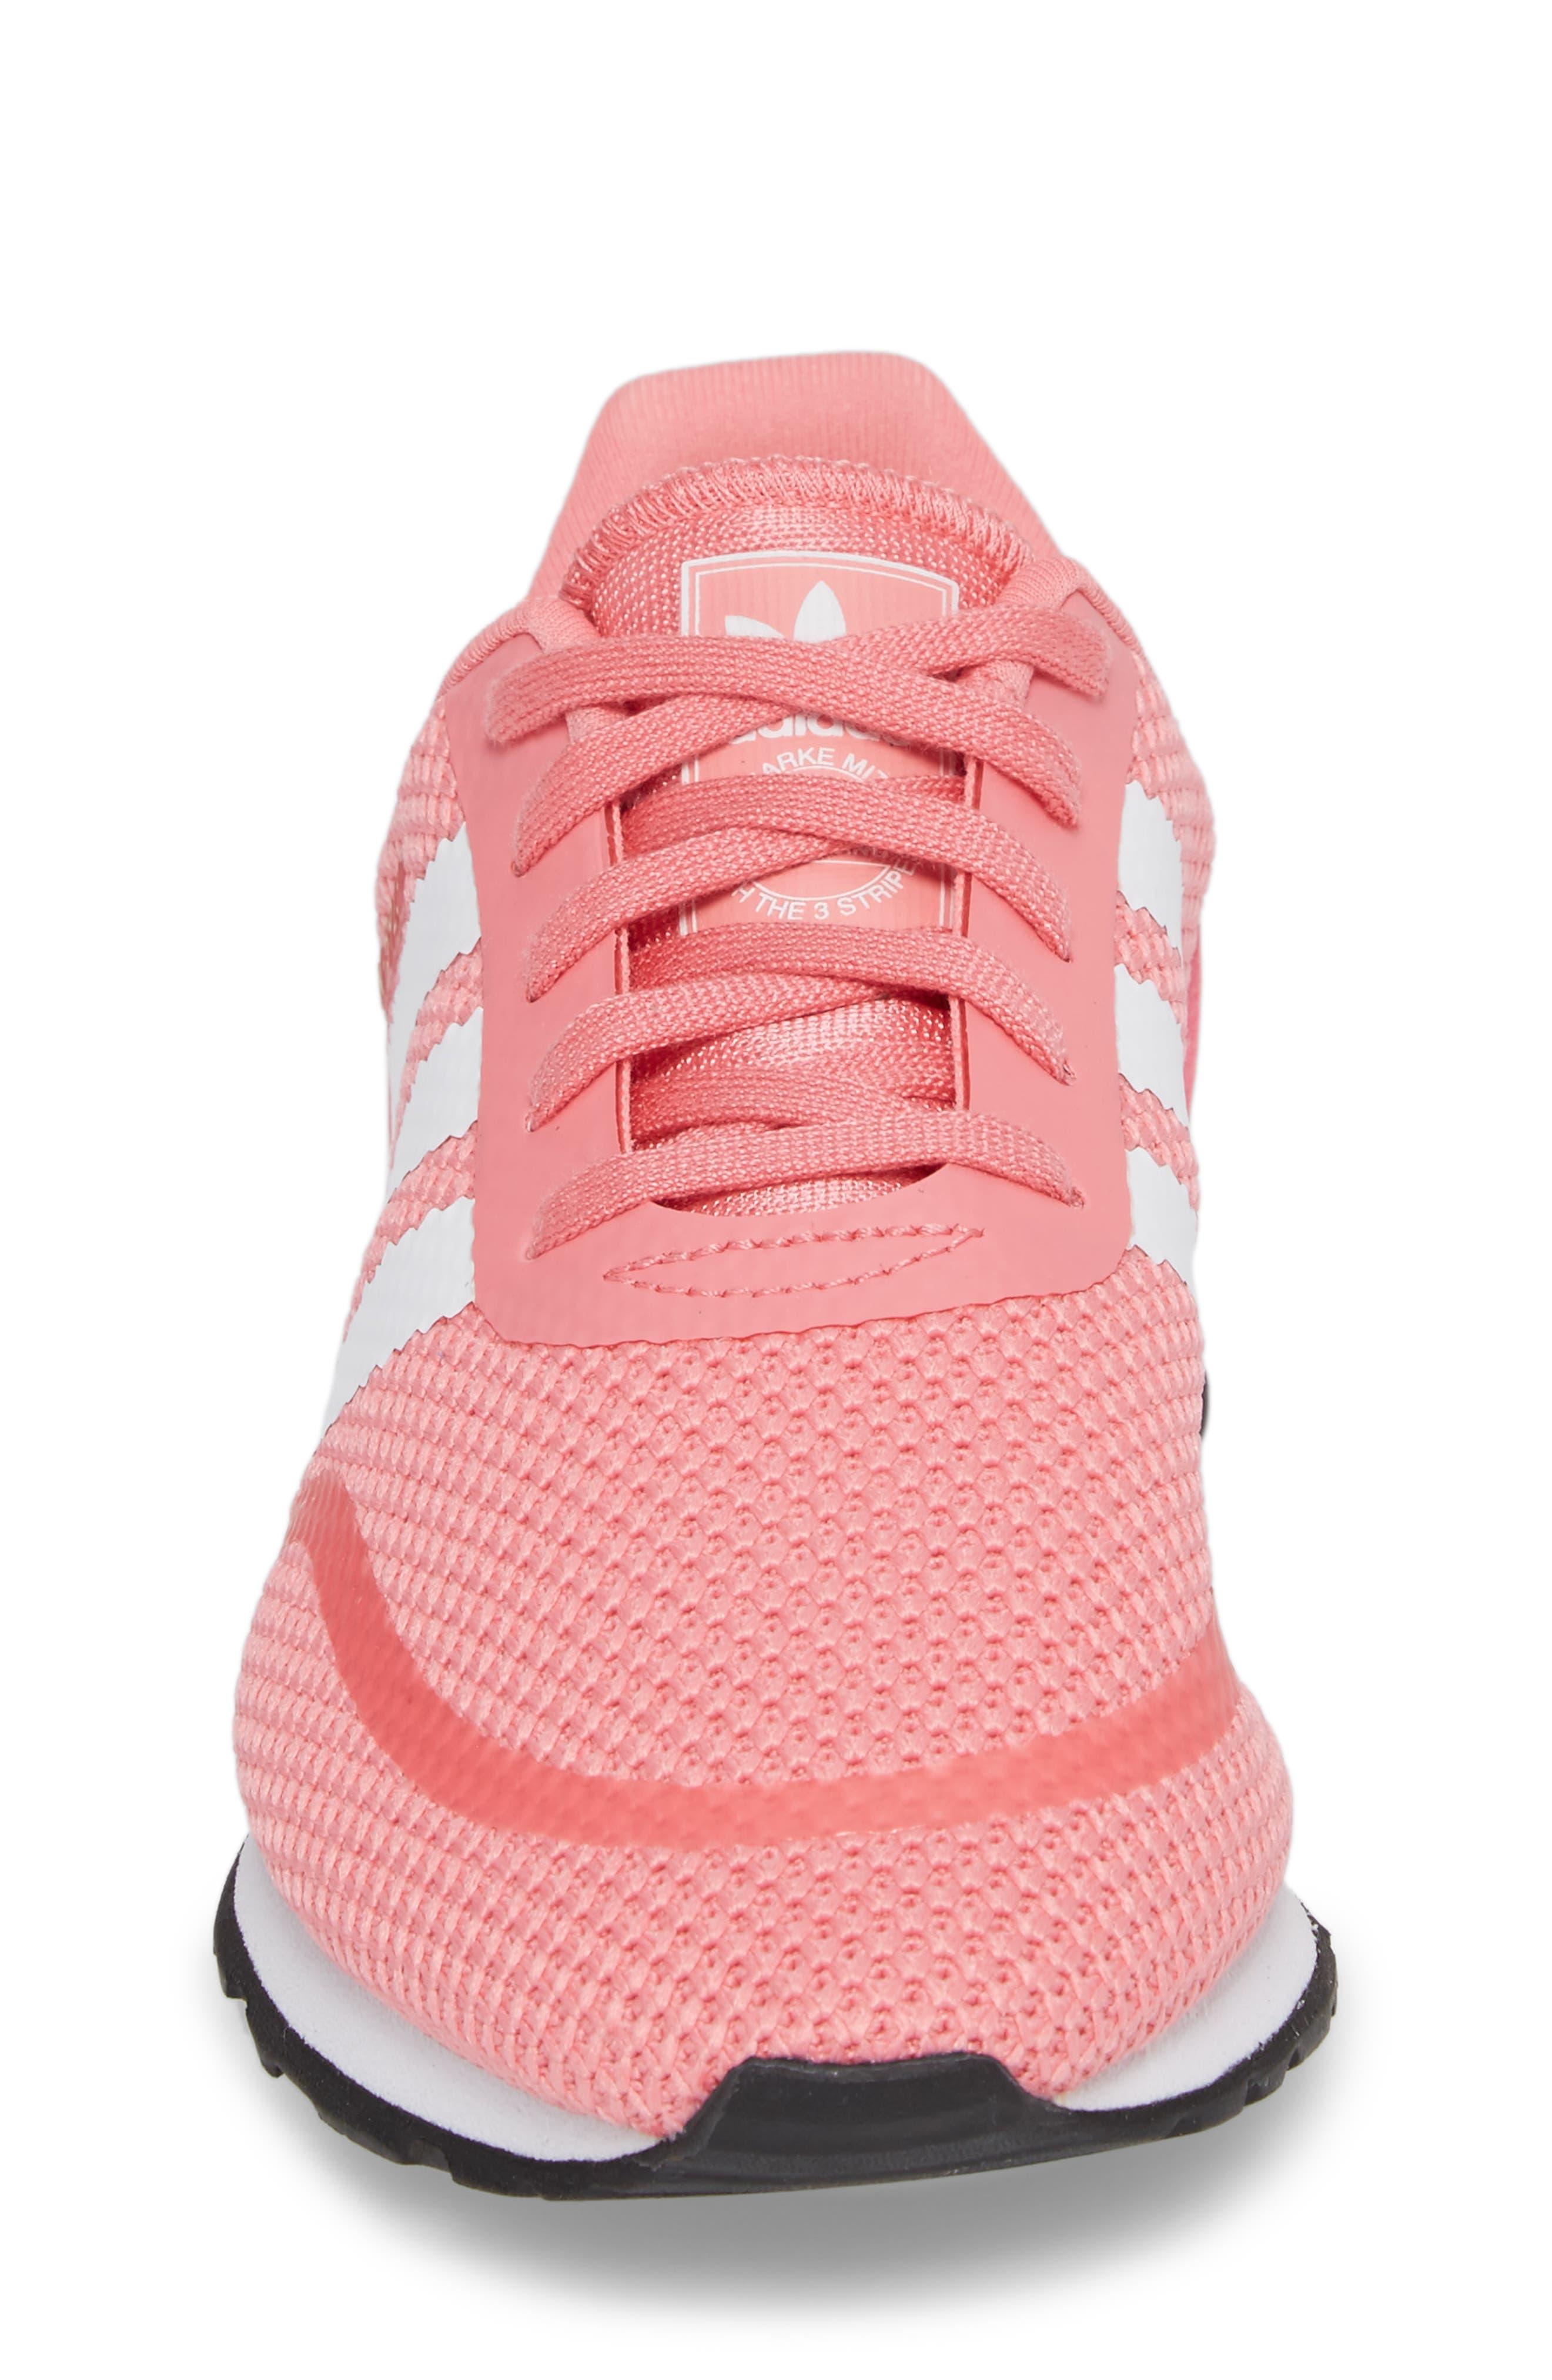 N-5923 Sneaker,                             Alternate thumbnail 4, color,                             Chalk Pink / White / White